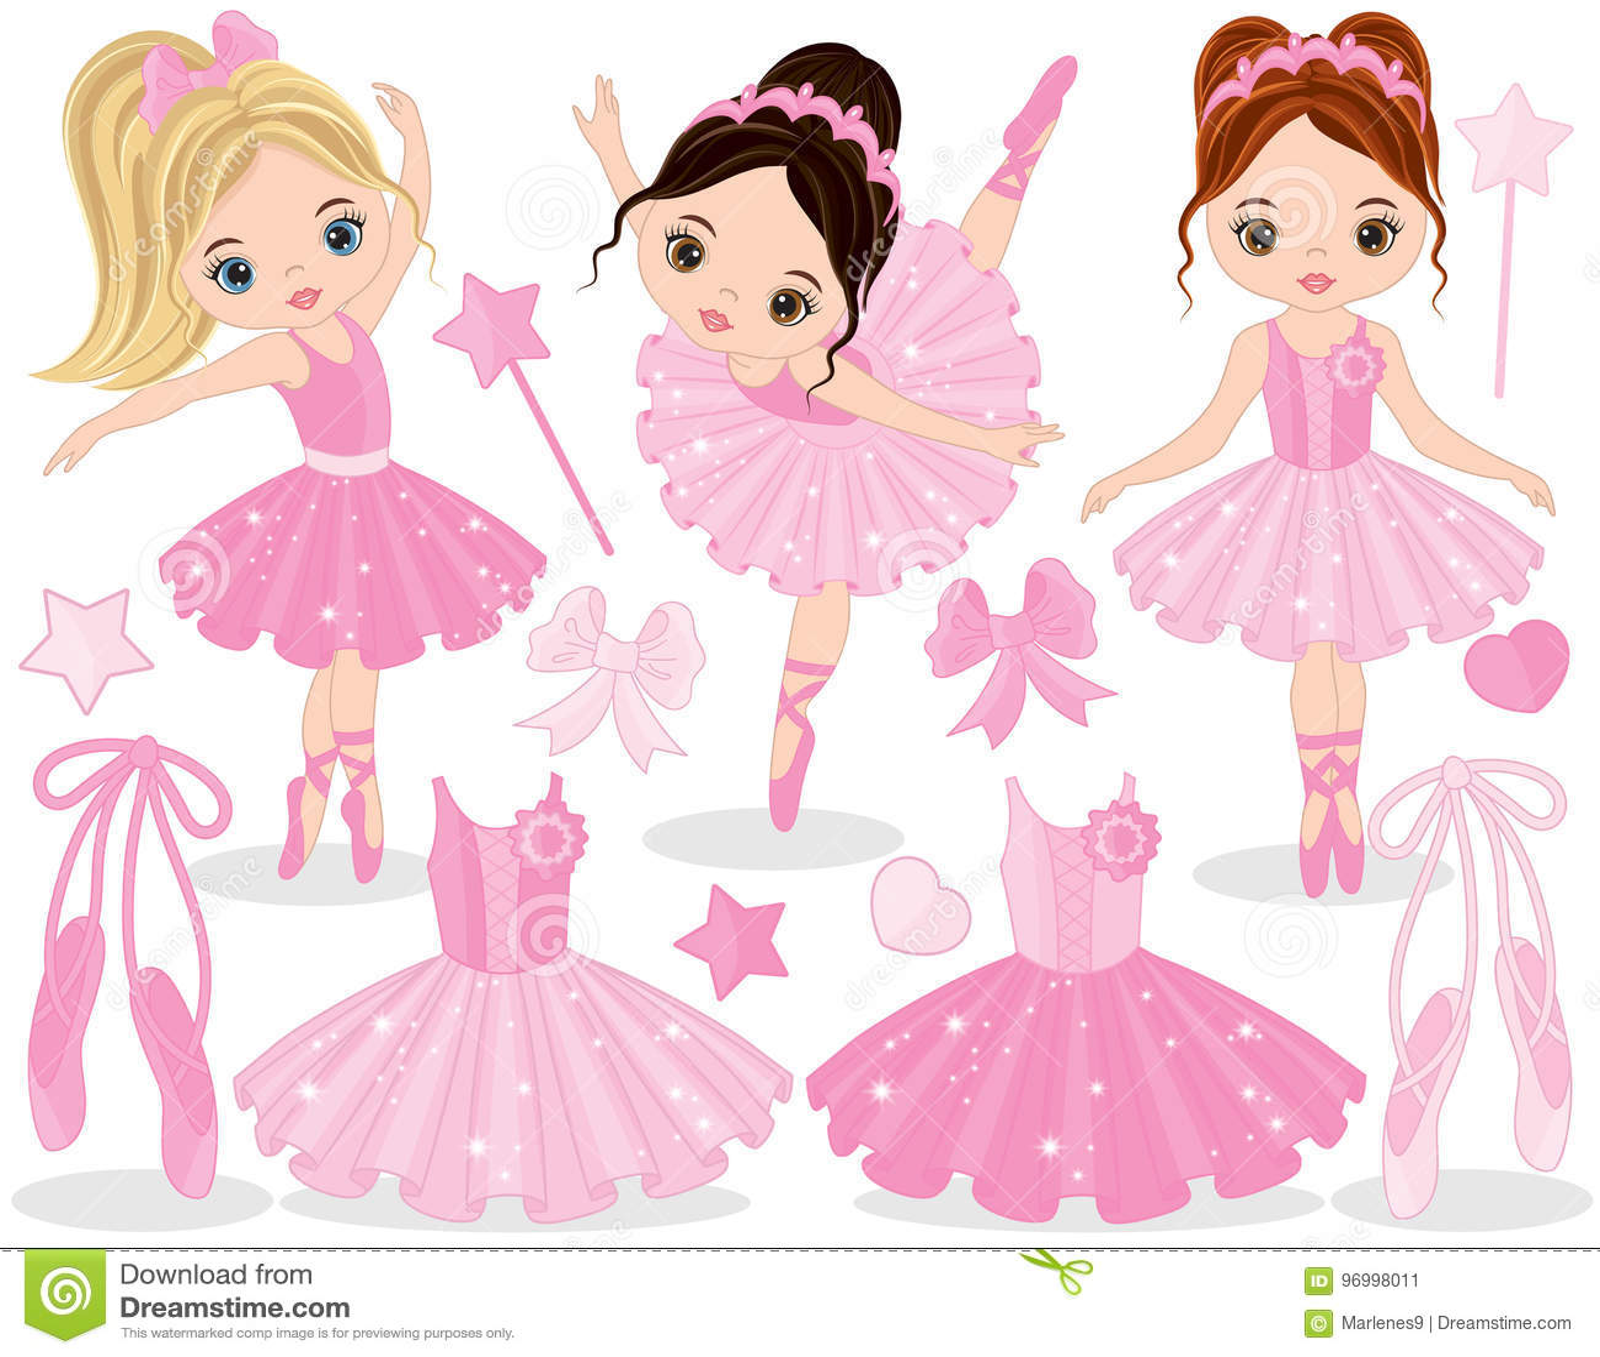 a66b524841f Διάνυσμα που τίθεται με τα χαριτωμένα μικρά ballerinas, τα παπούτσια  μπαλέτου και το φόρεμα tutu Διανυσματικός μικρός χορός ballerinas  Διανυσματική ...